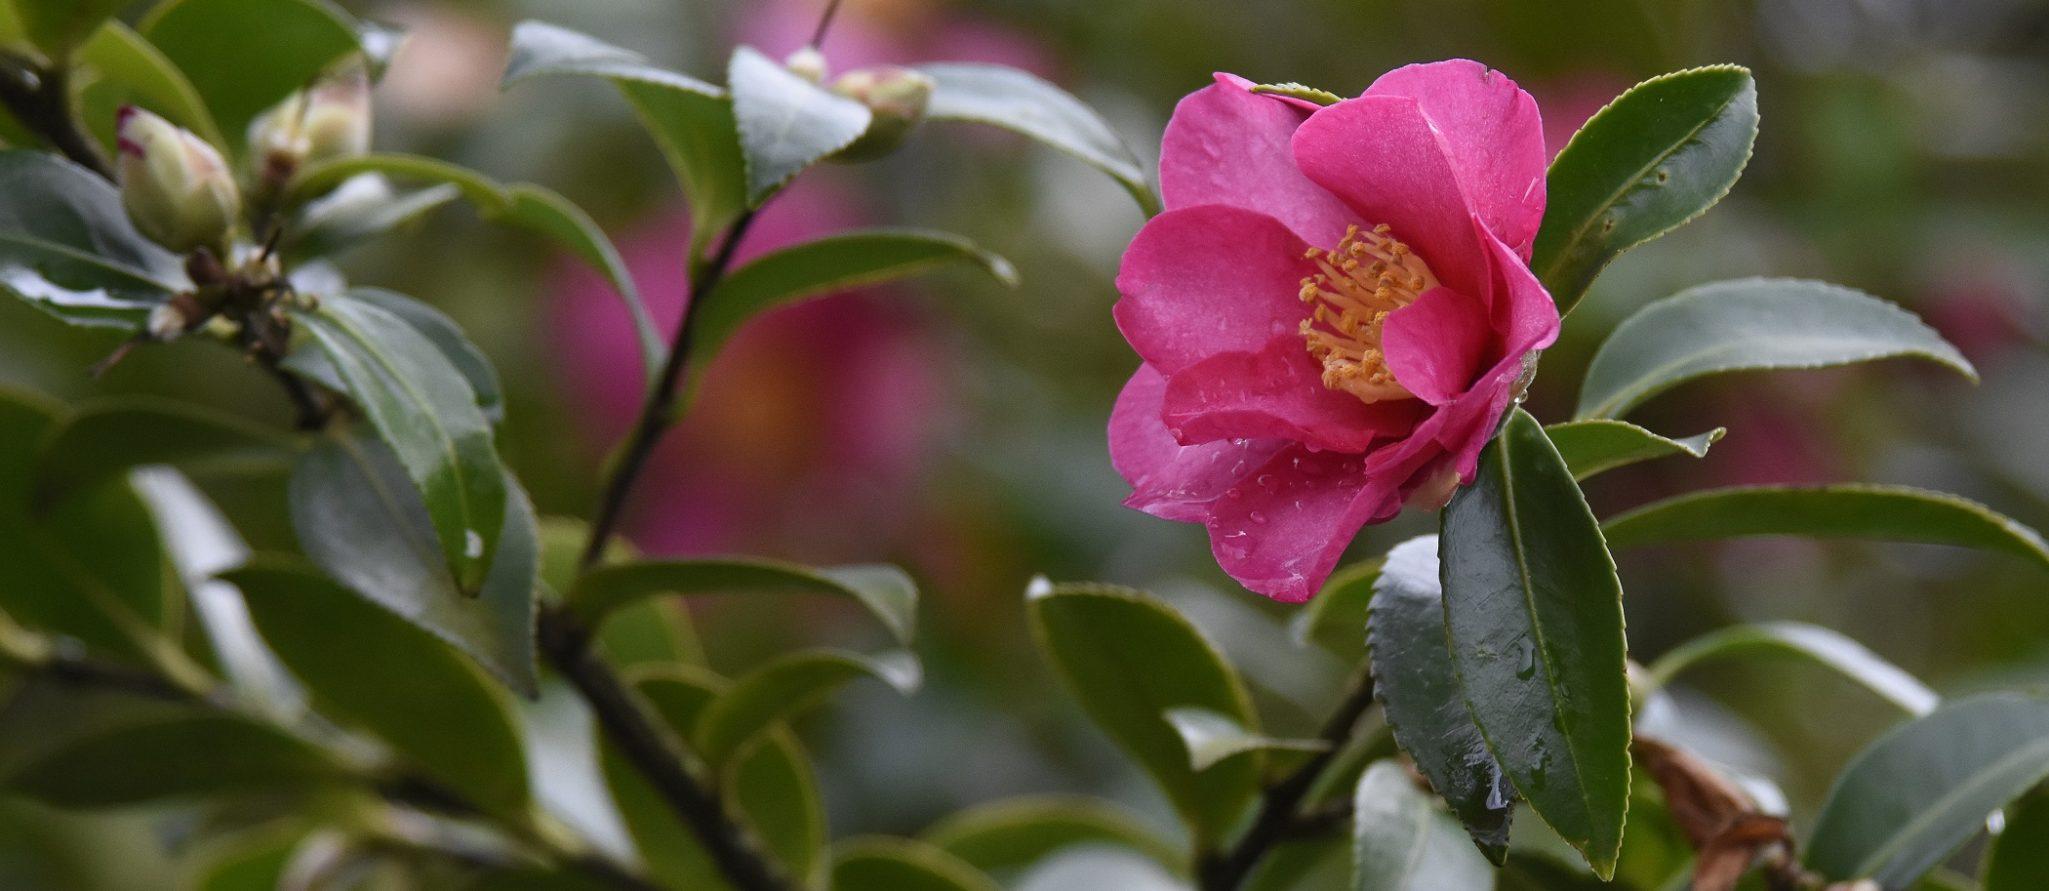 rode japanse roos